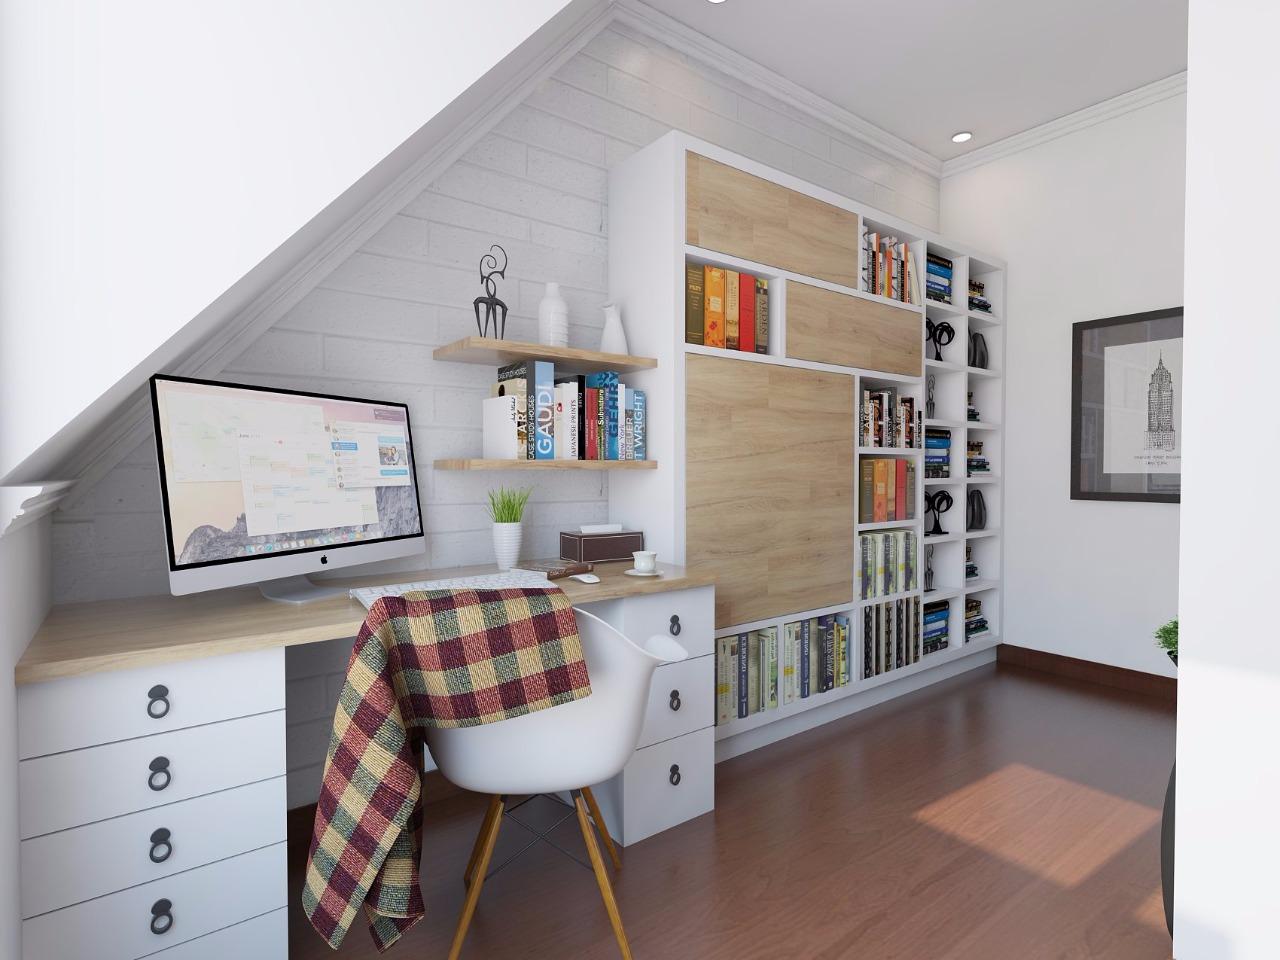 Scandinavia's Shelf | Niaga Art